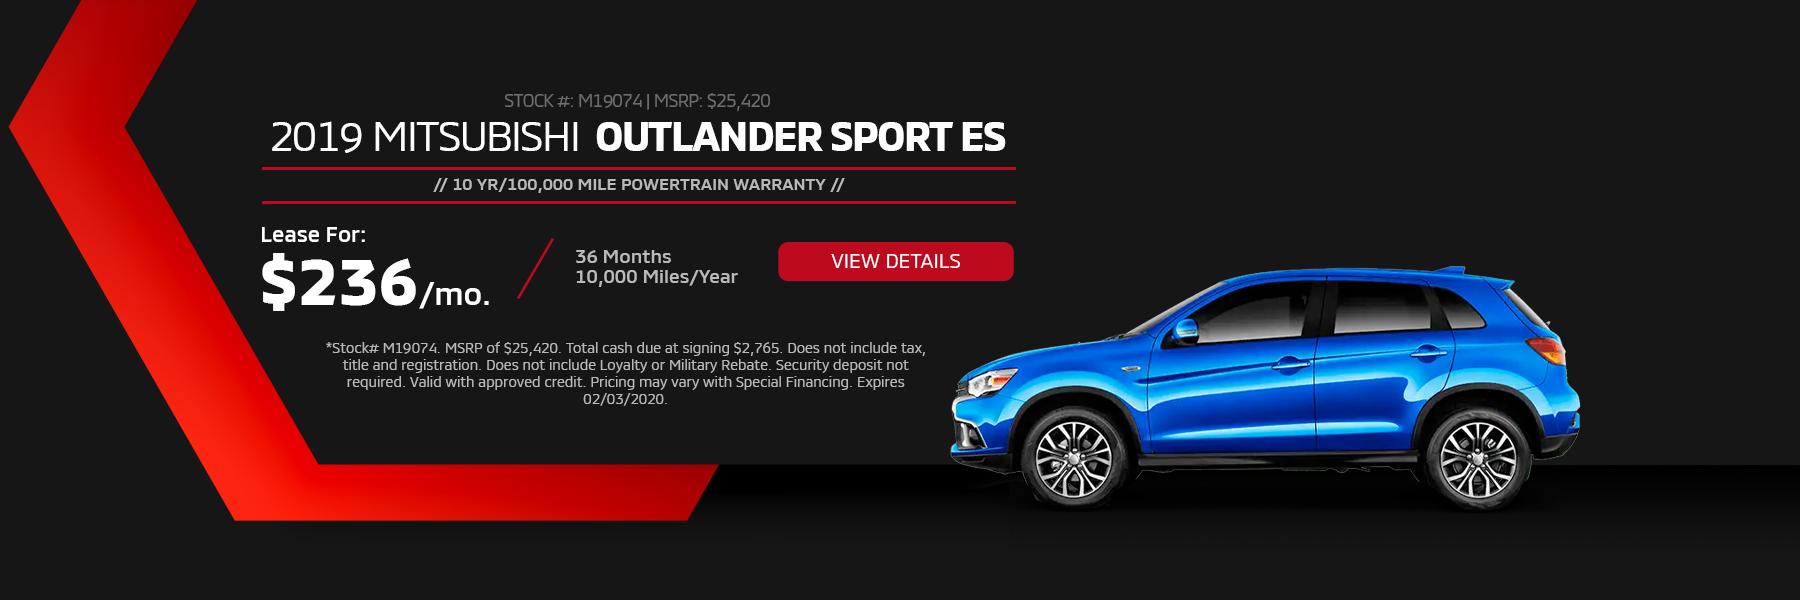 2019 Mitsubishi Outlander Sport ES